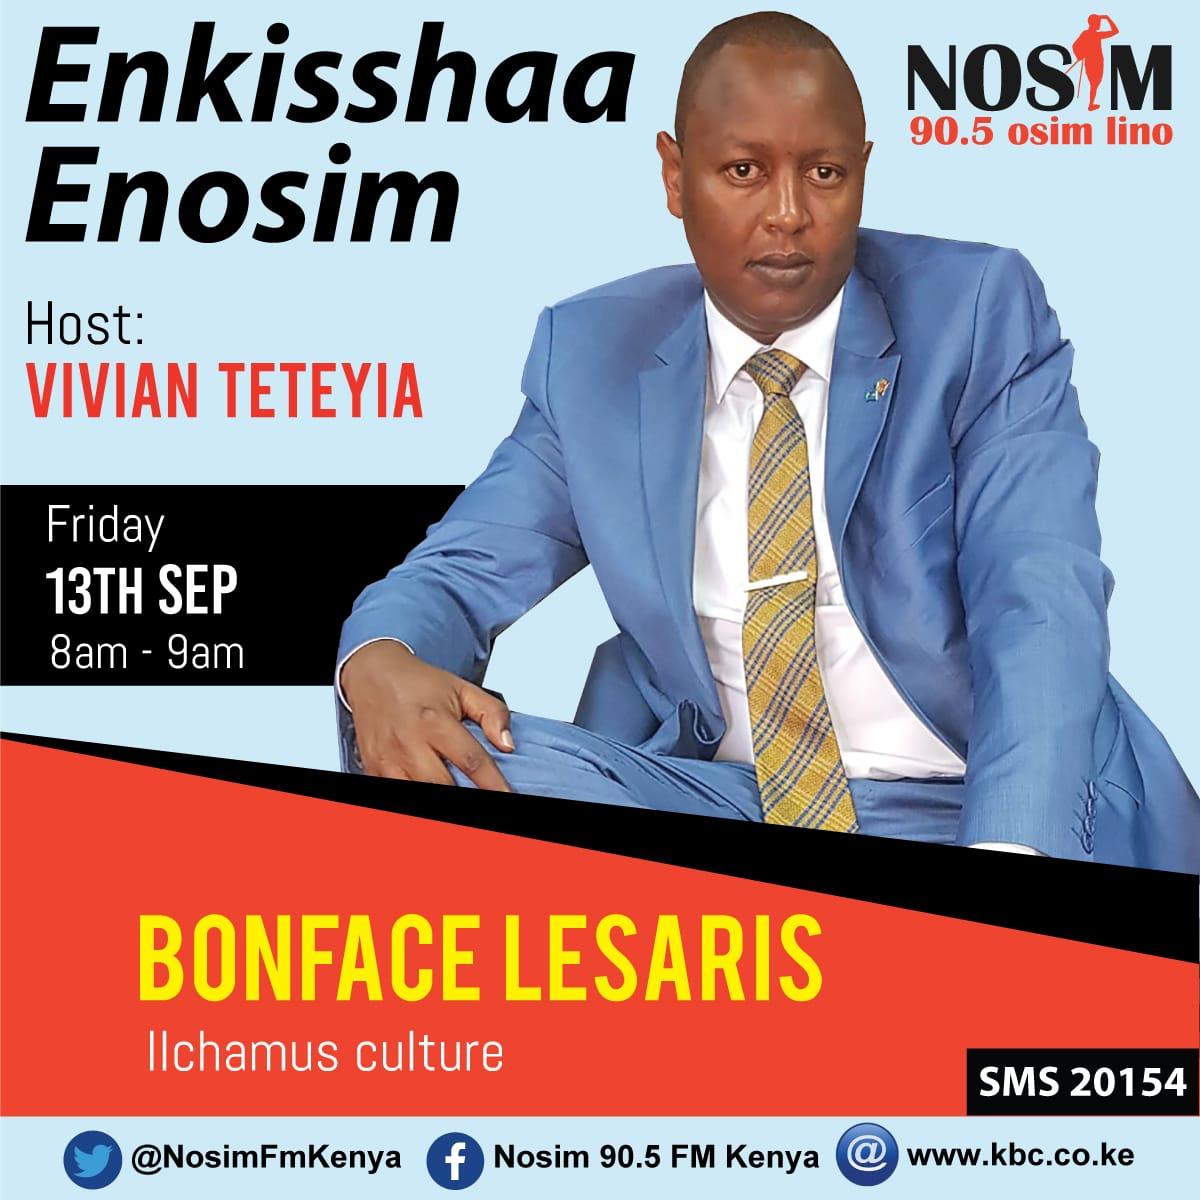 Vivian Teteyia will be hosting Kiongozi Boniface Lesaris live on Radio @NosimFmKenya tomorrow morning from 8am-9am. The conversation will encompass around Ilchamus Culture, MAU forest Conservation, MAA unity among other developments @teteyia @KBCChannel1 @Nkumumjackson1